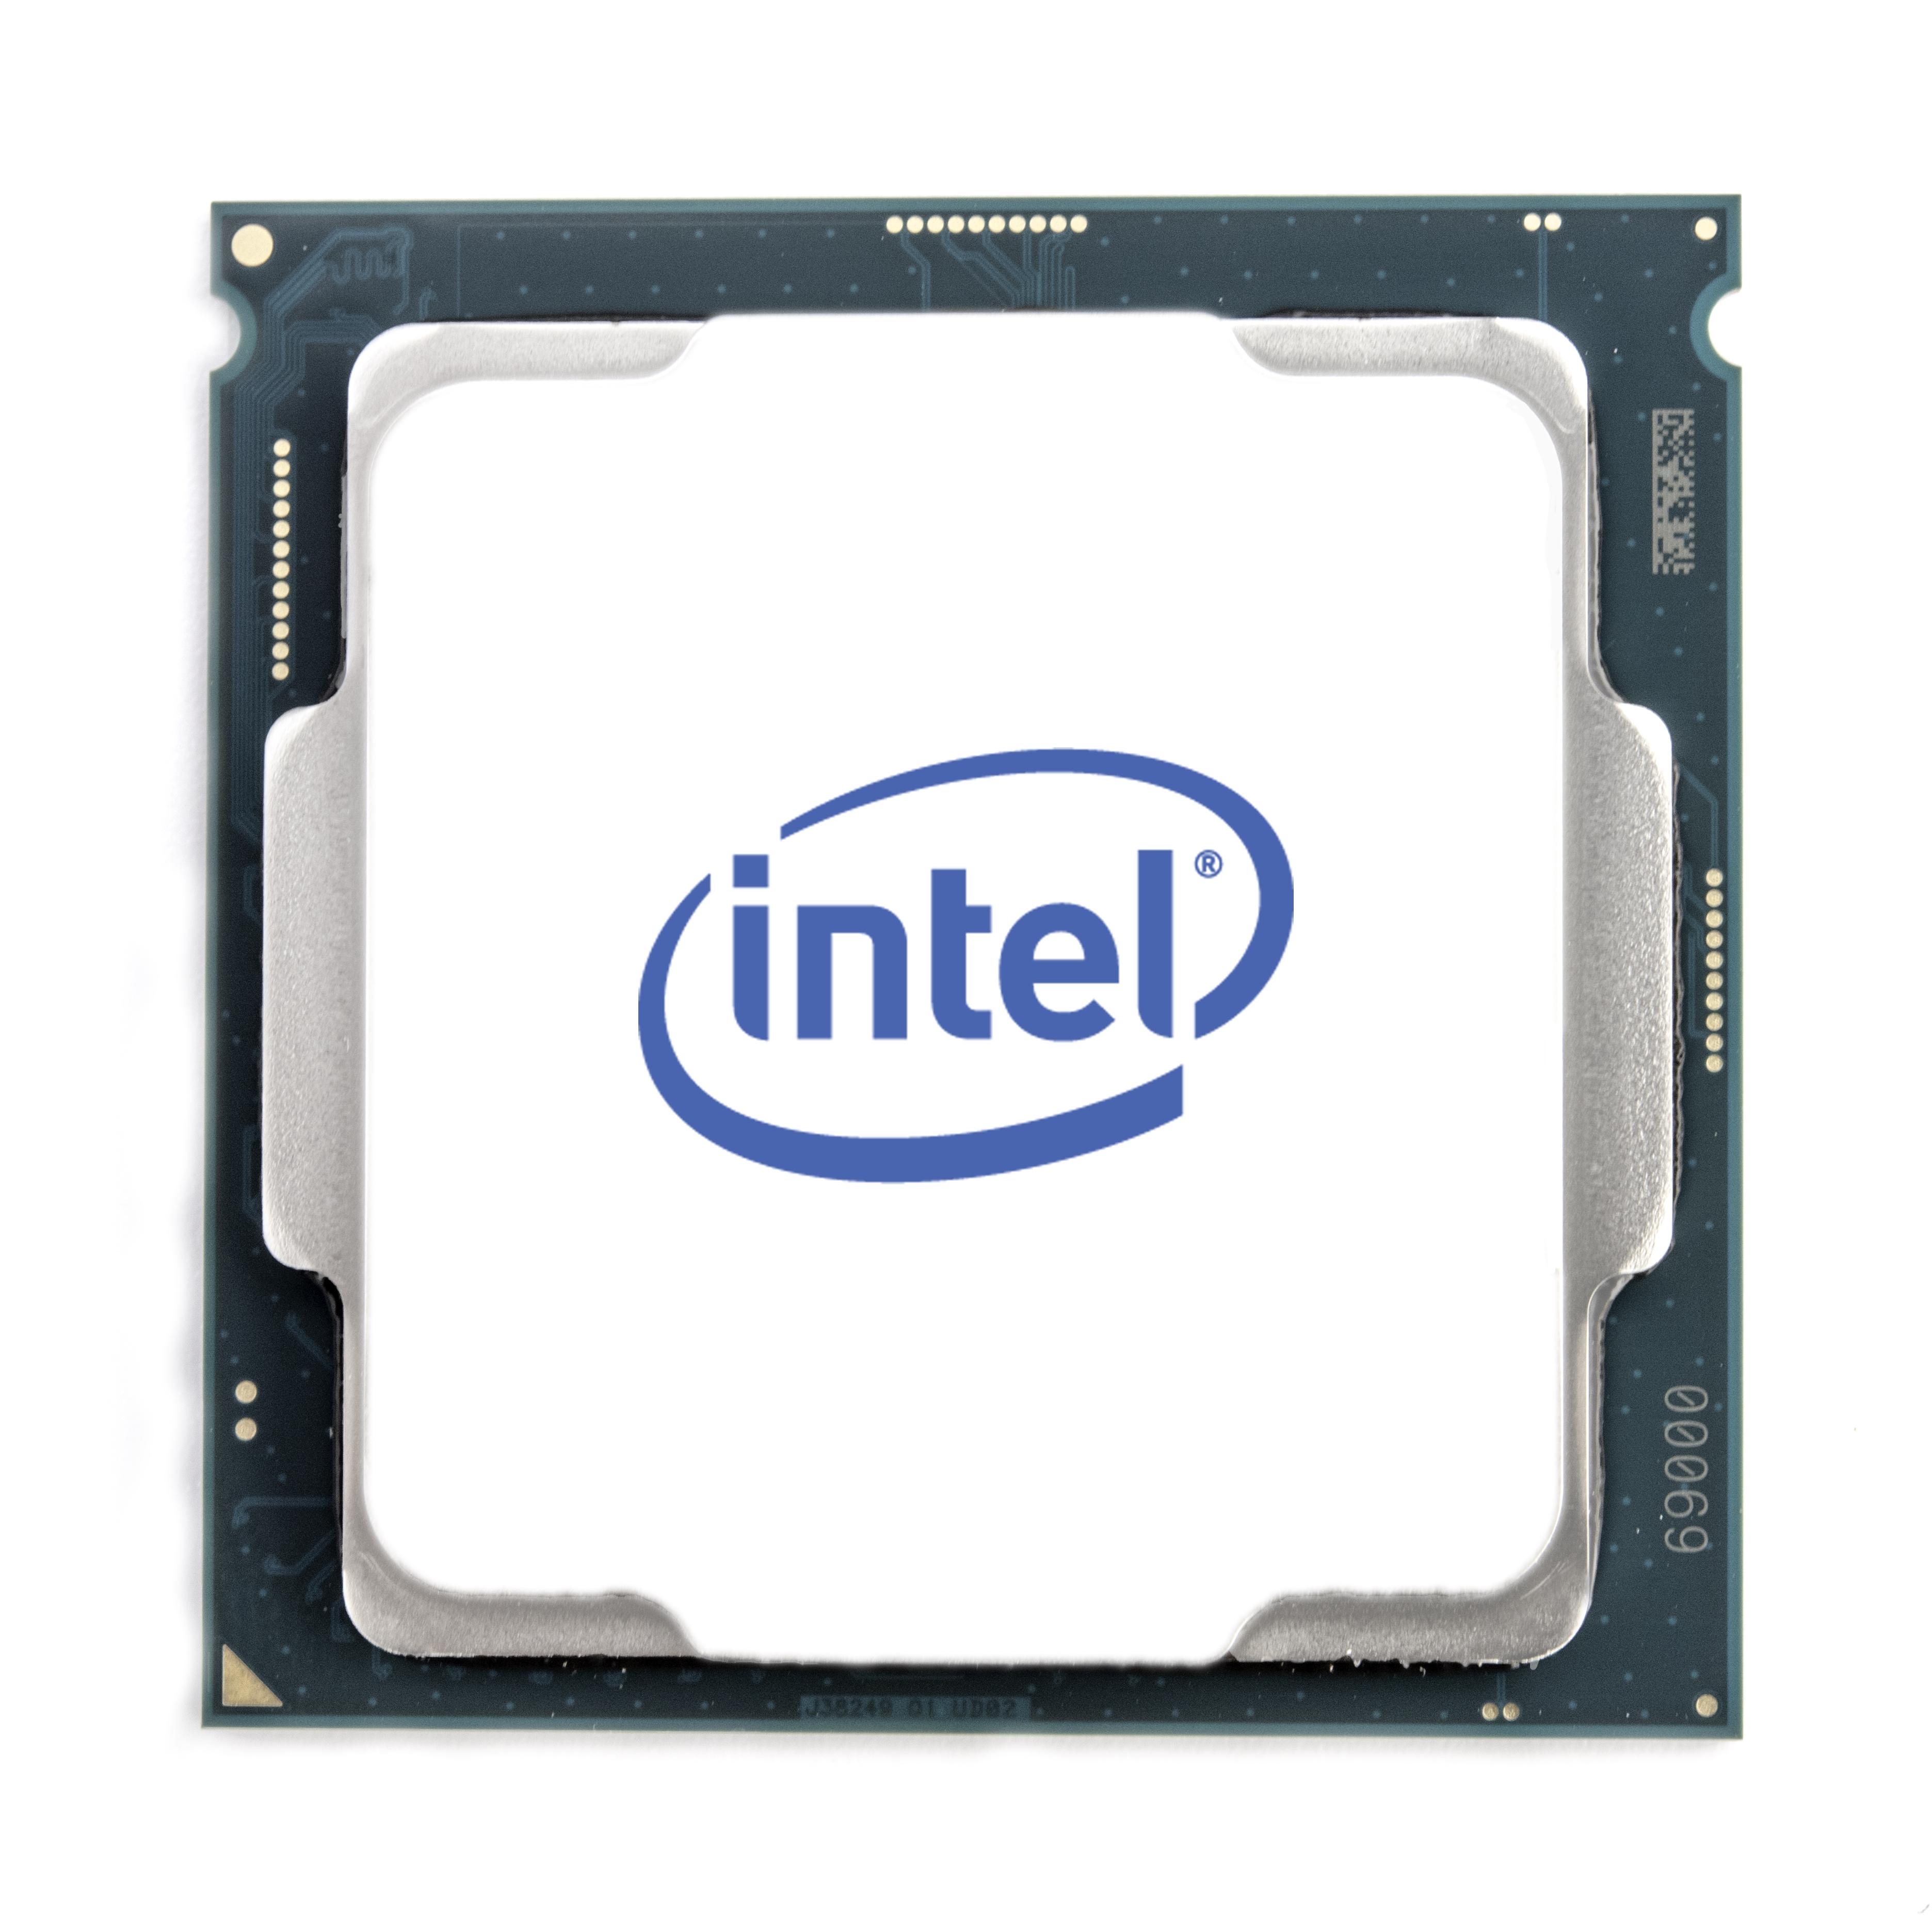 Intel Xeon Silver 4110 Tray Processor 8 Core 2.10GHZ 11MB 85W CD8067303561400